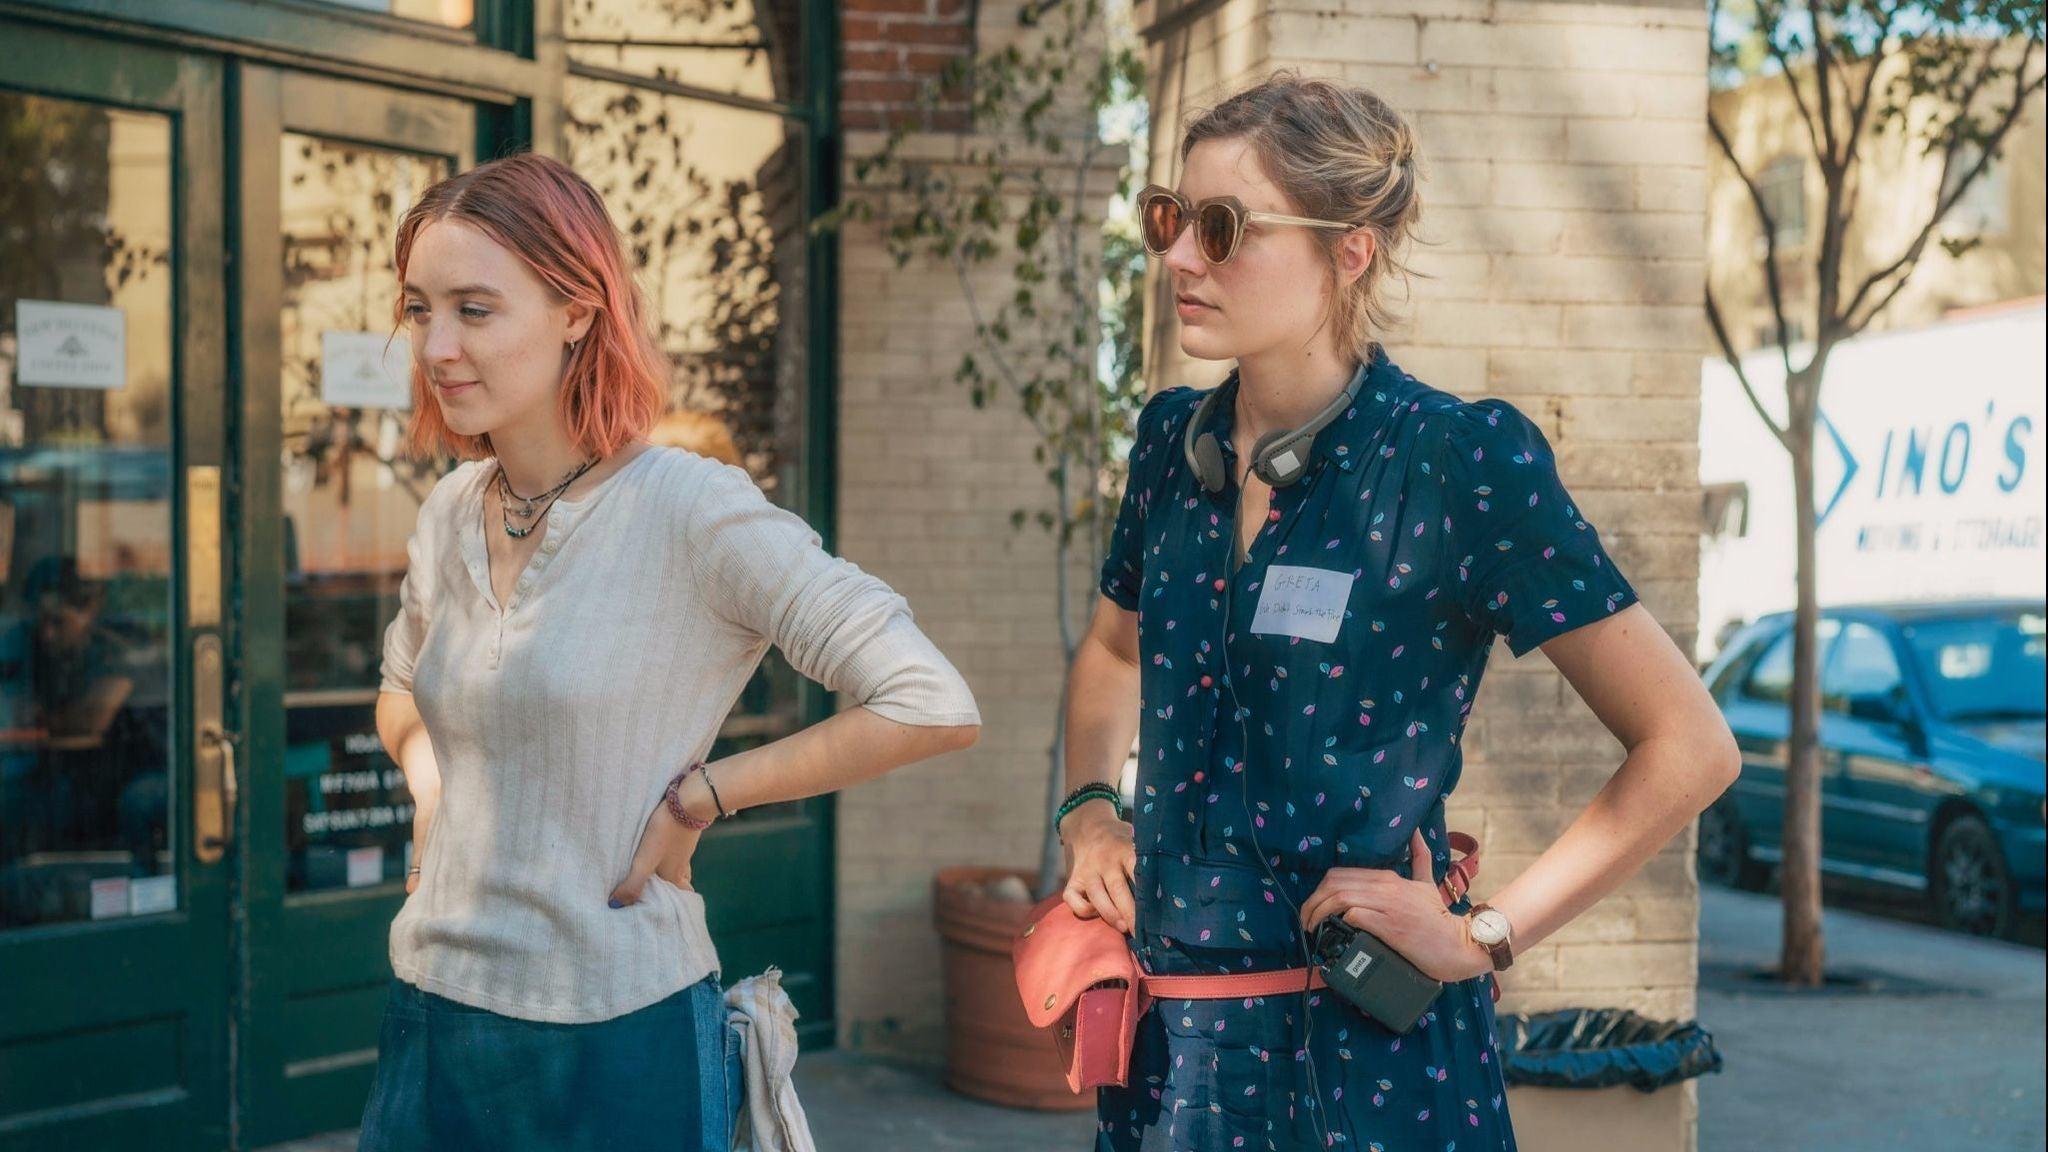 Greta Gerwig and Saoirse Roan on set for Lady Bird